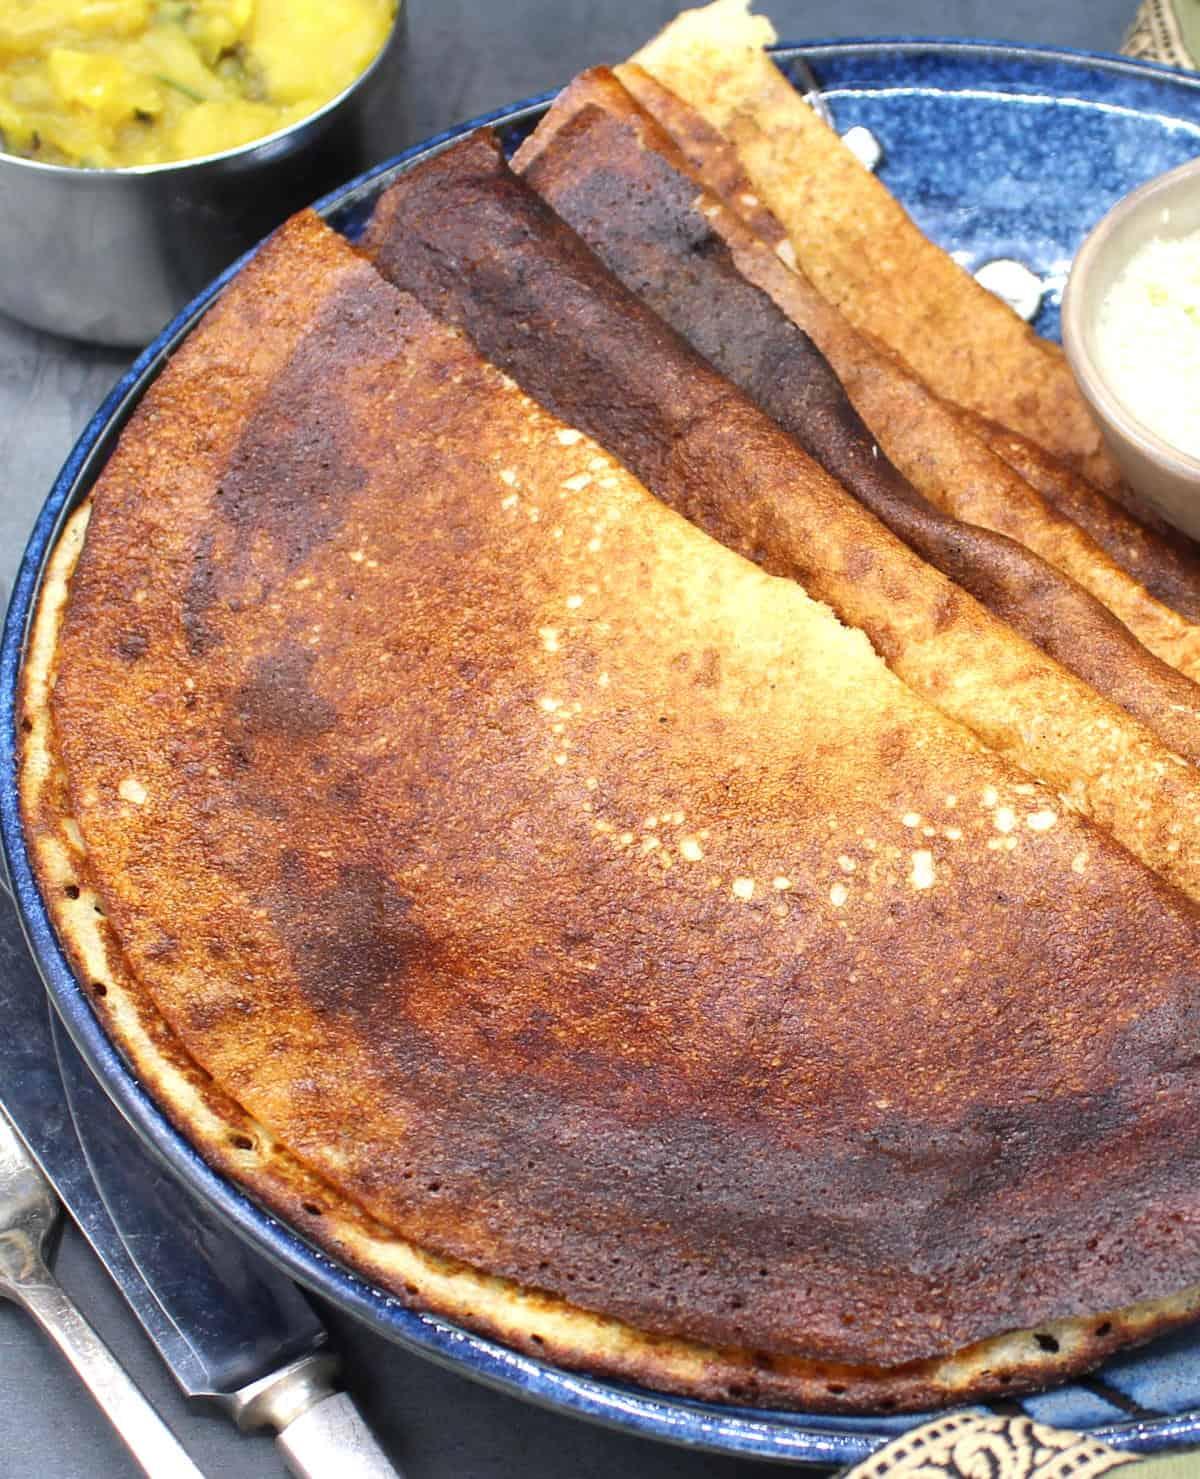 Front partial photo of quinoa dosa on plate with potato sabzi.